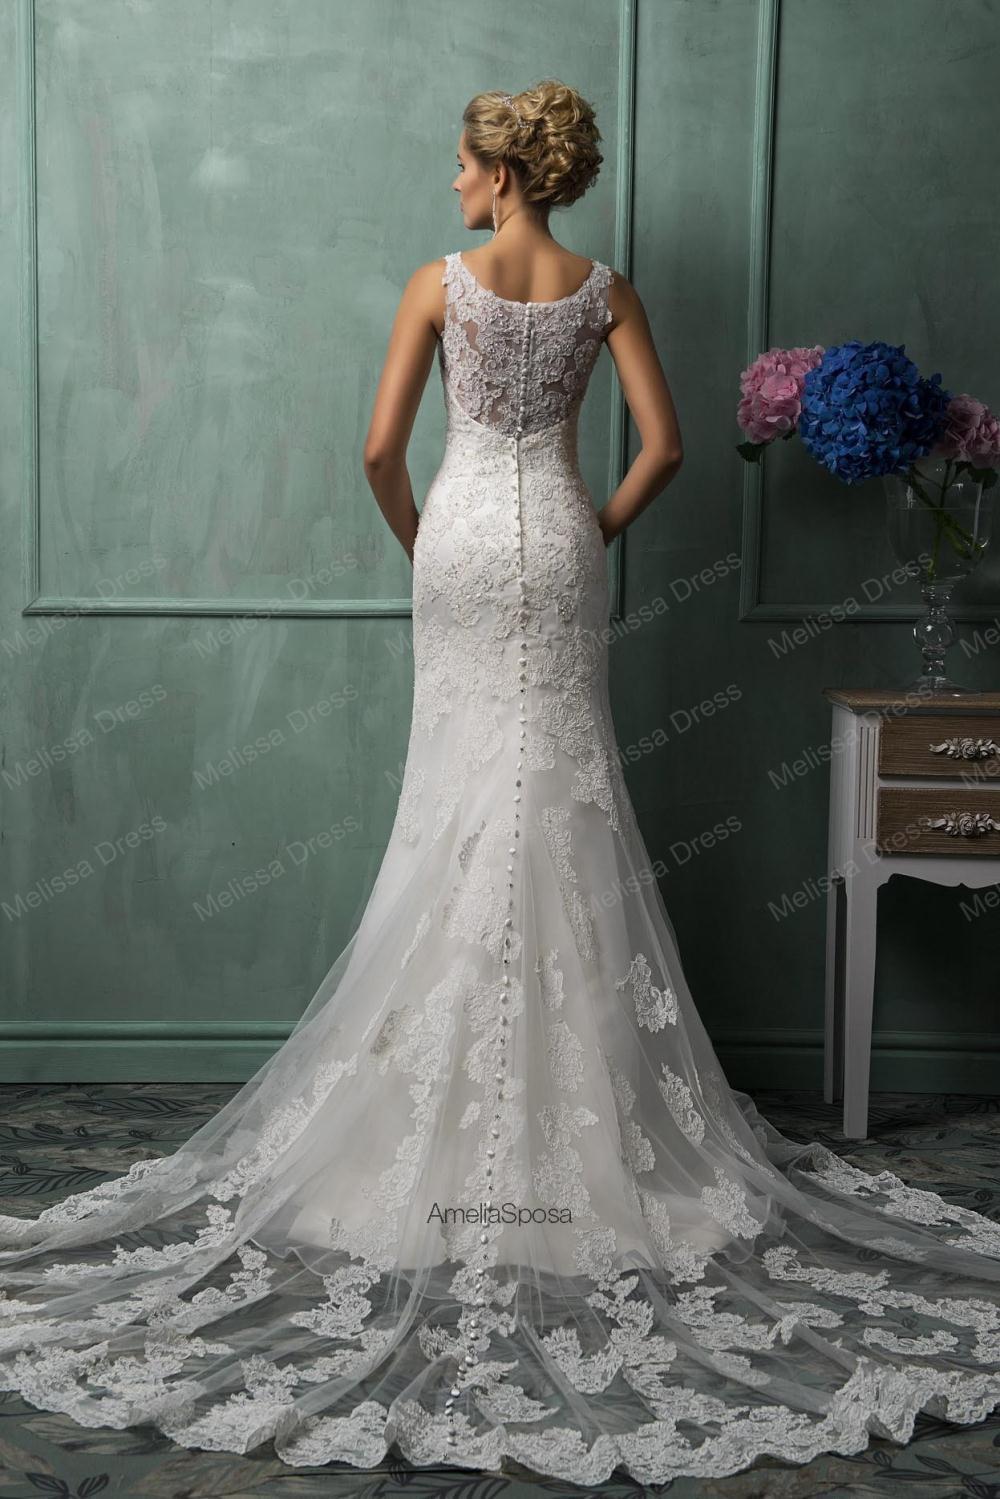 see through wedding dress see through wedding dresses Long Sleeve See Through Beaded Wedding Dresses